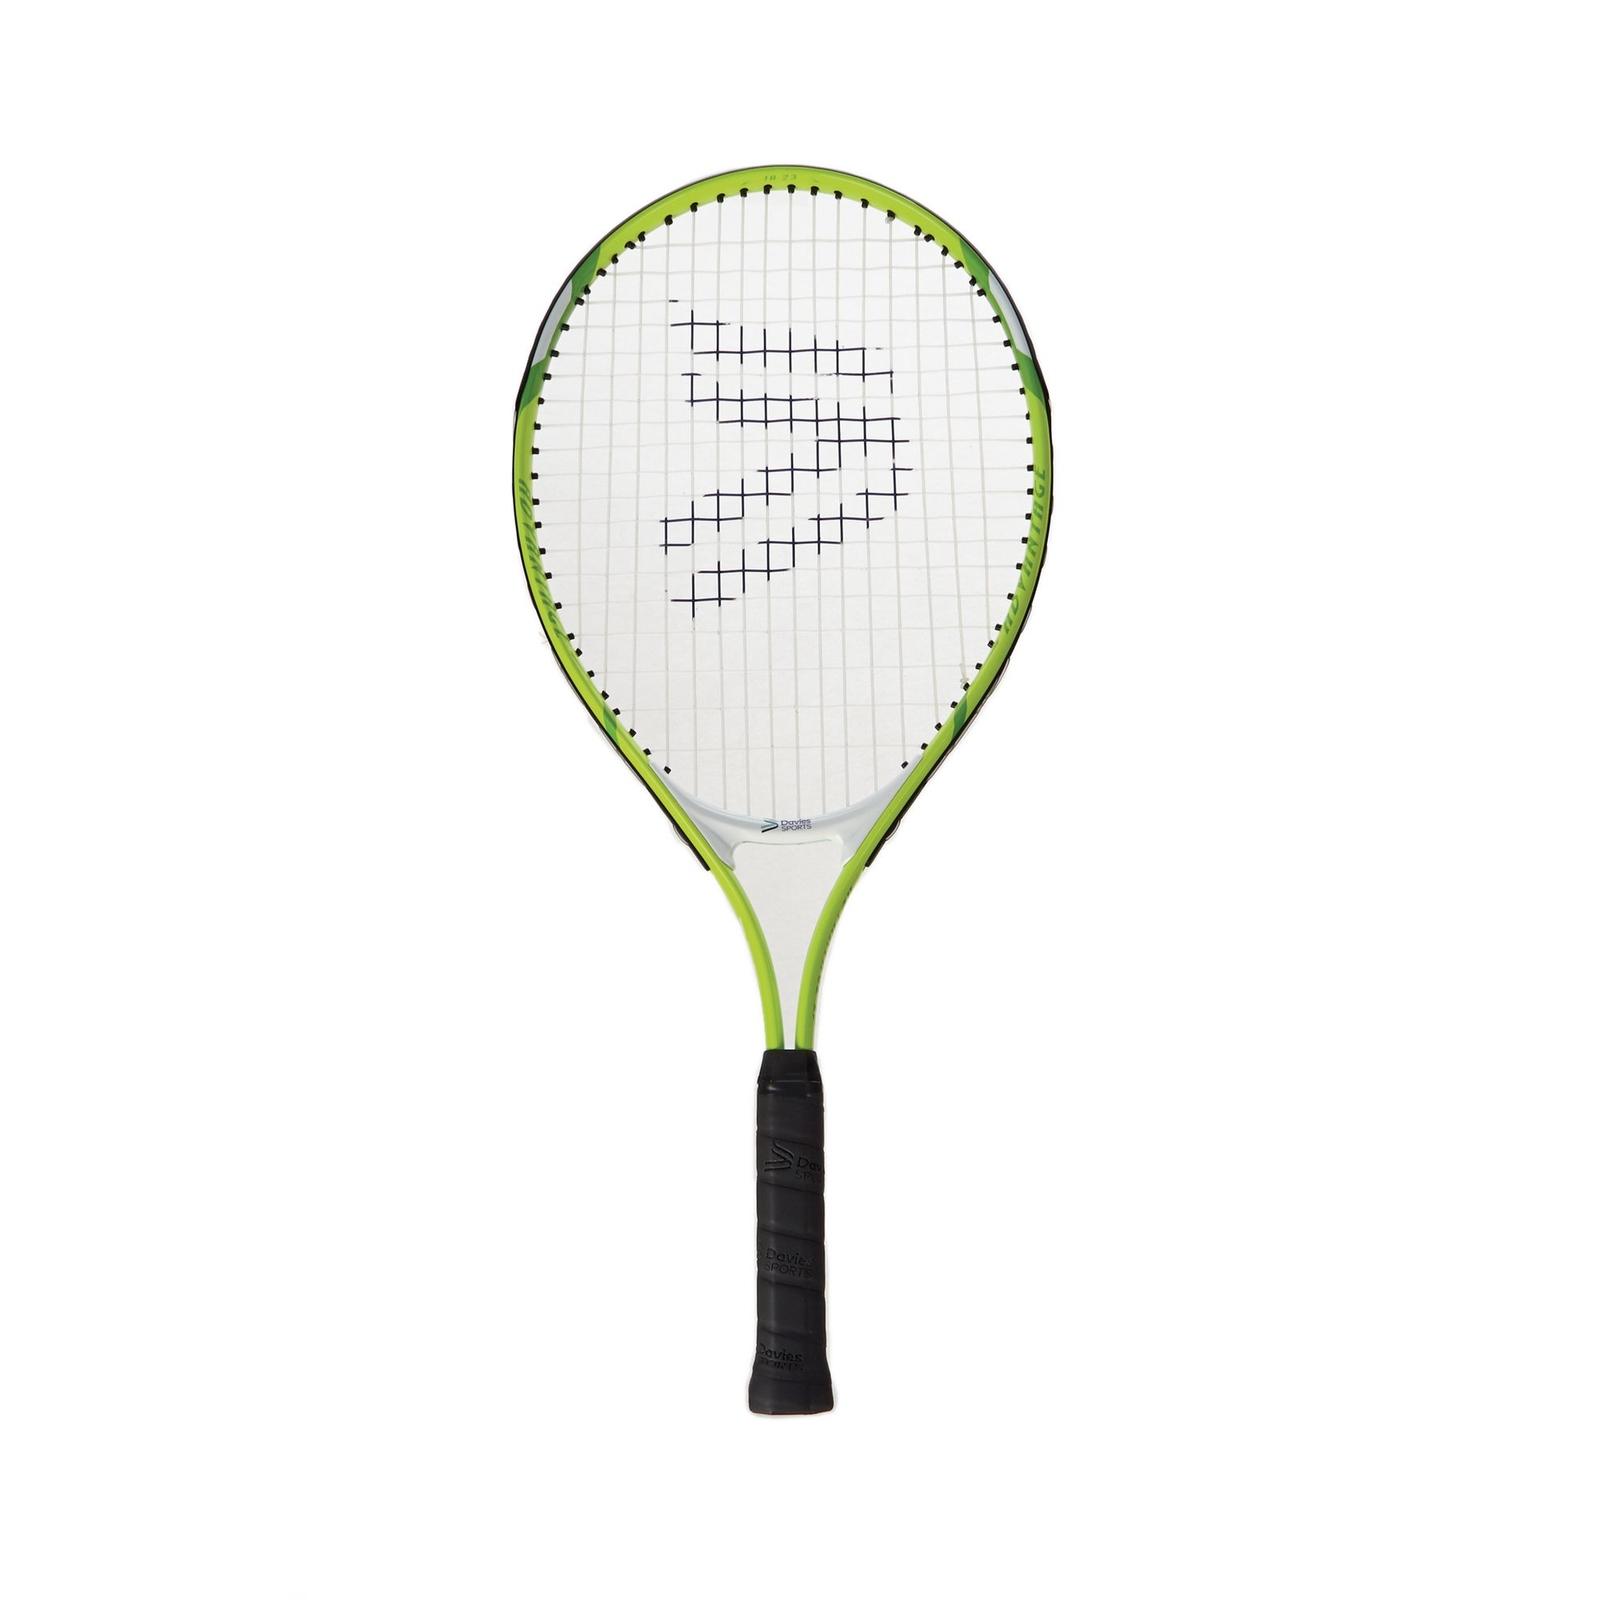 Davies Sports 23in Advantage Racquet